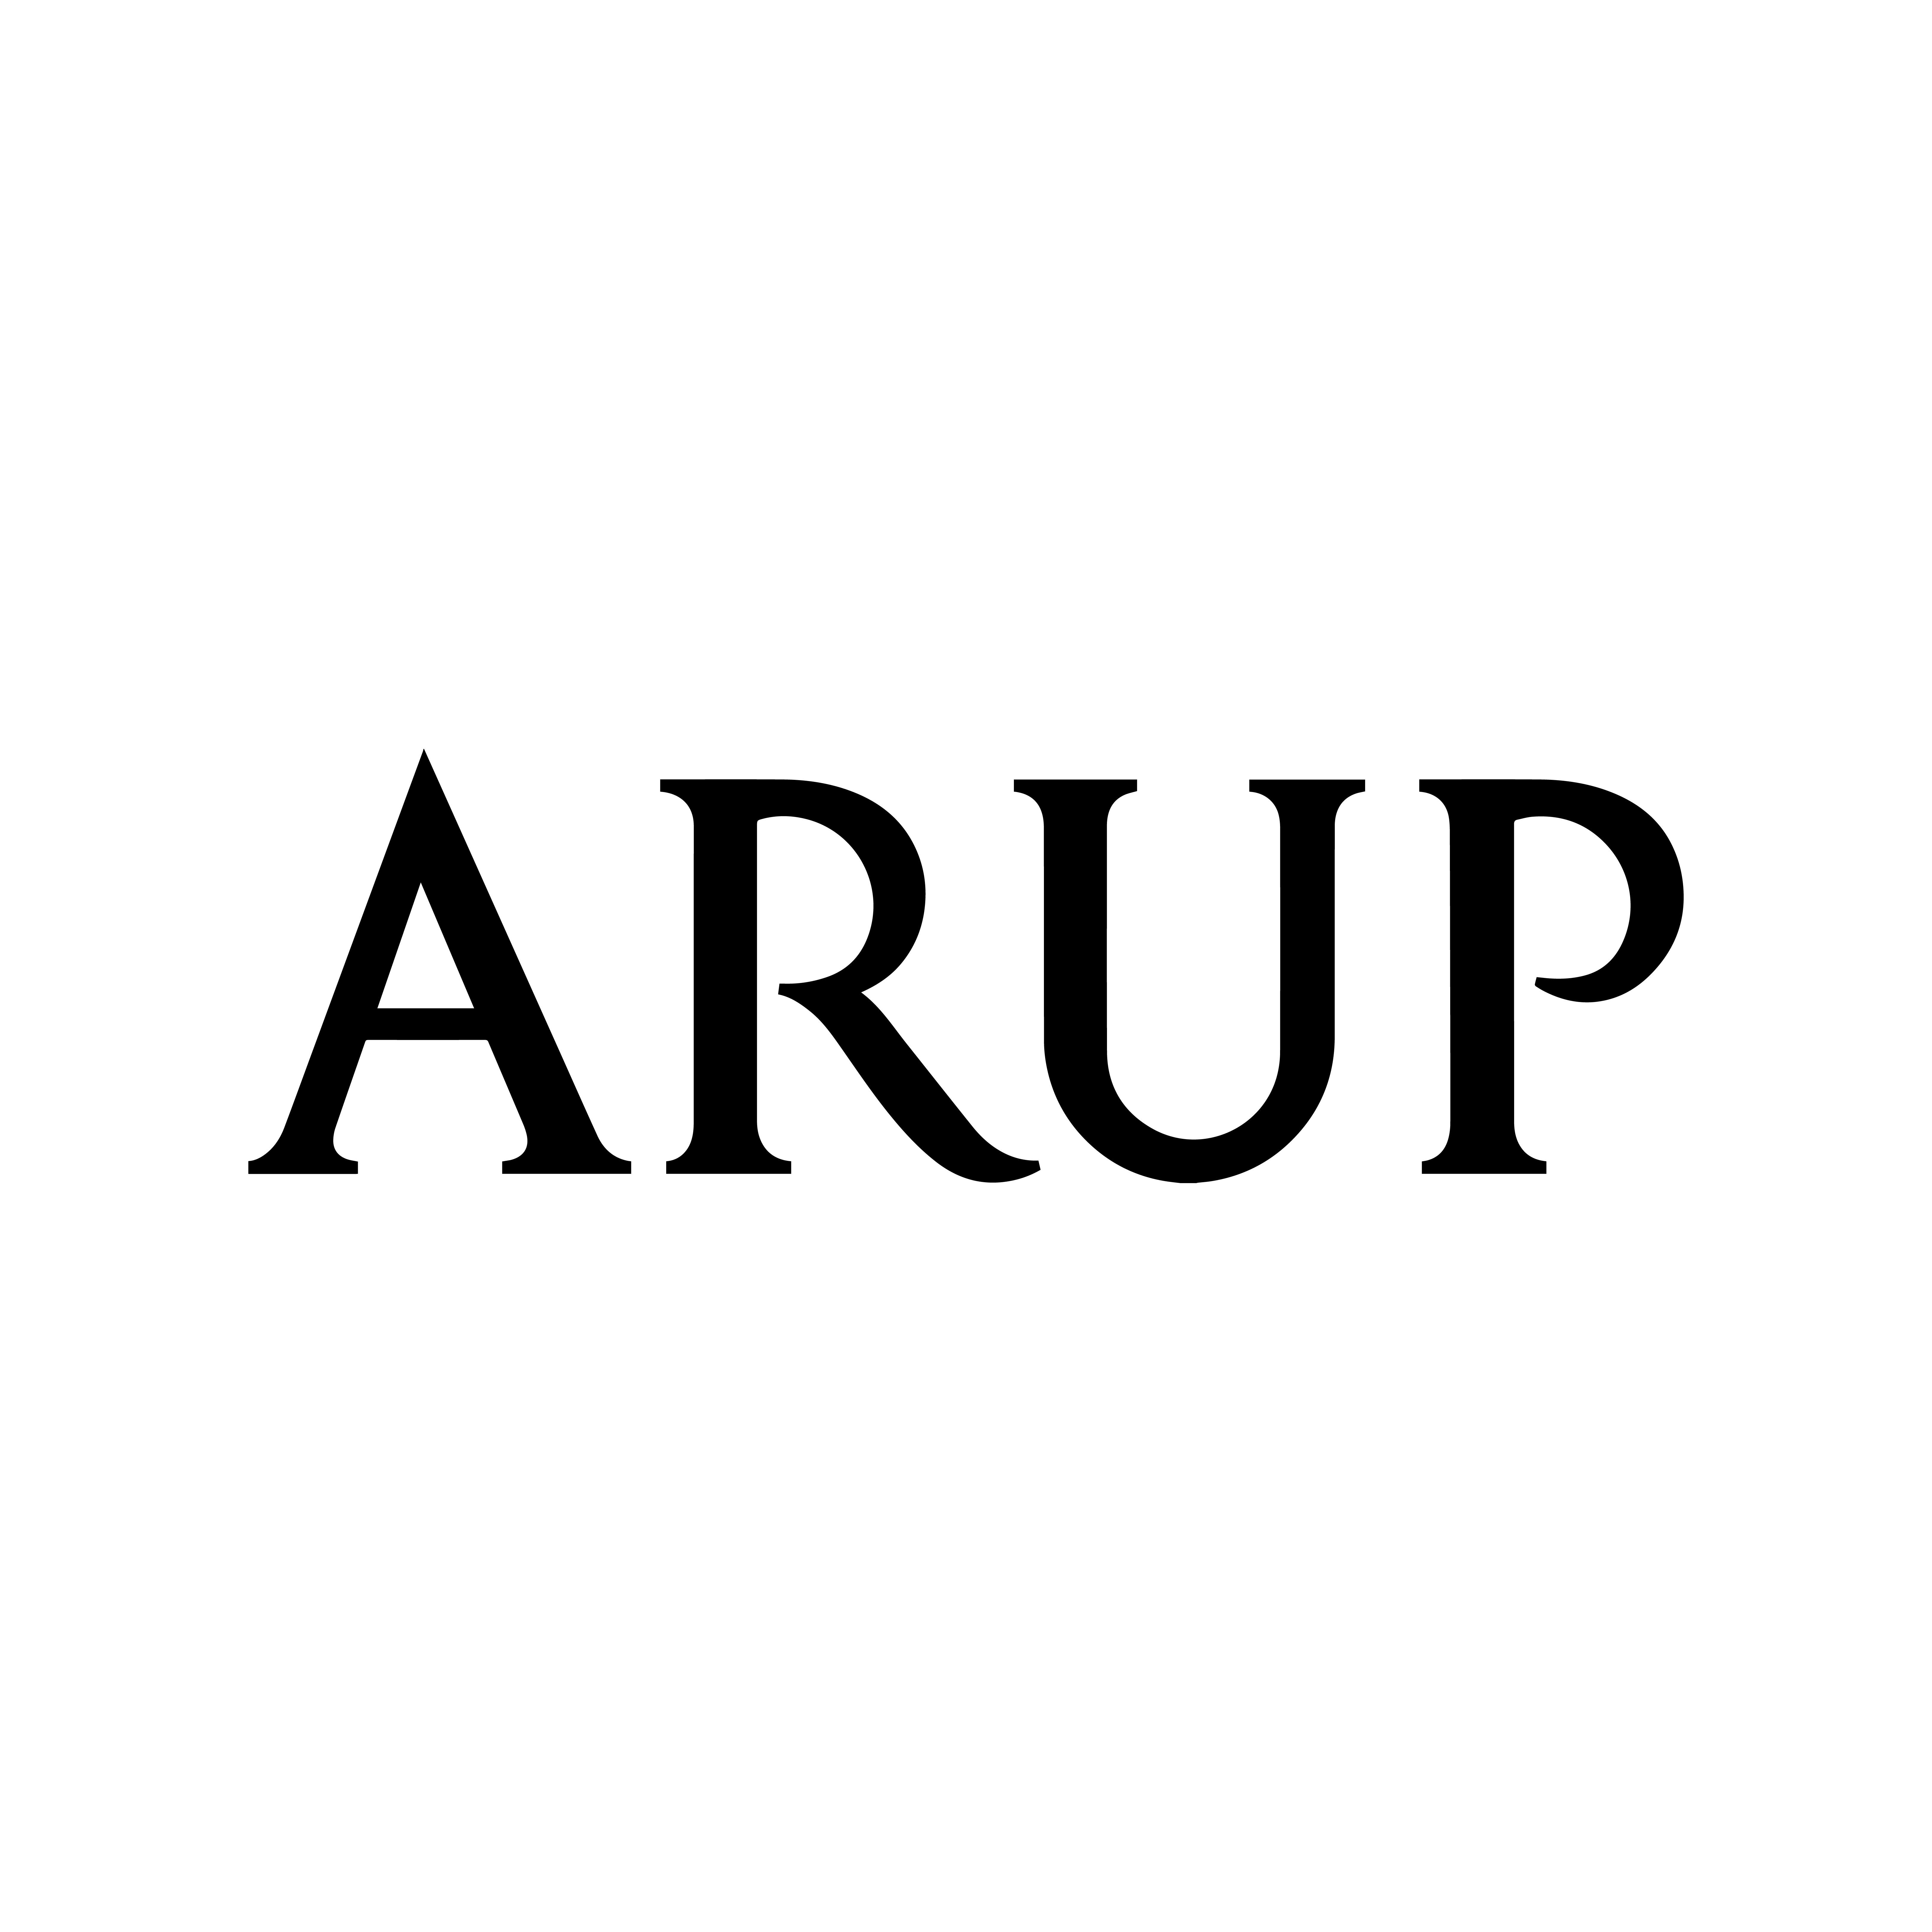 arup-01